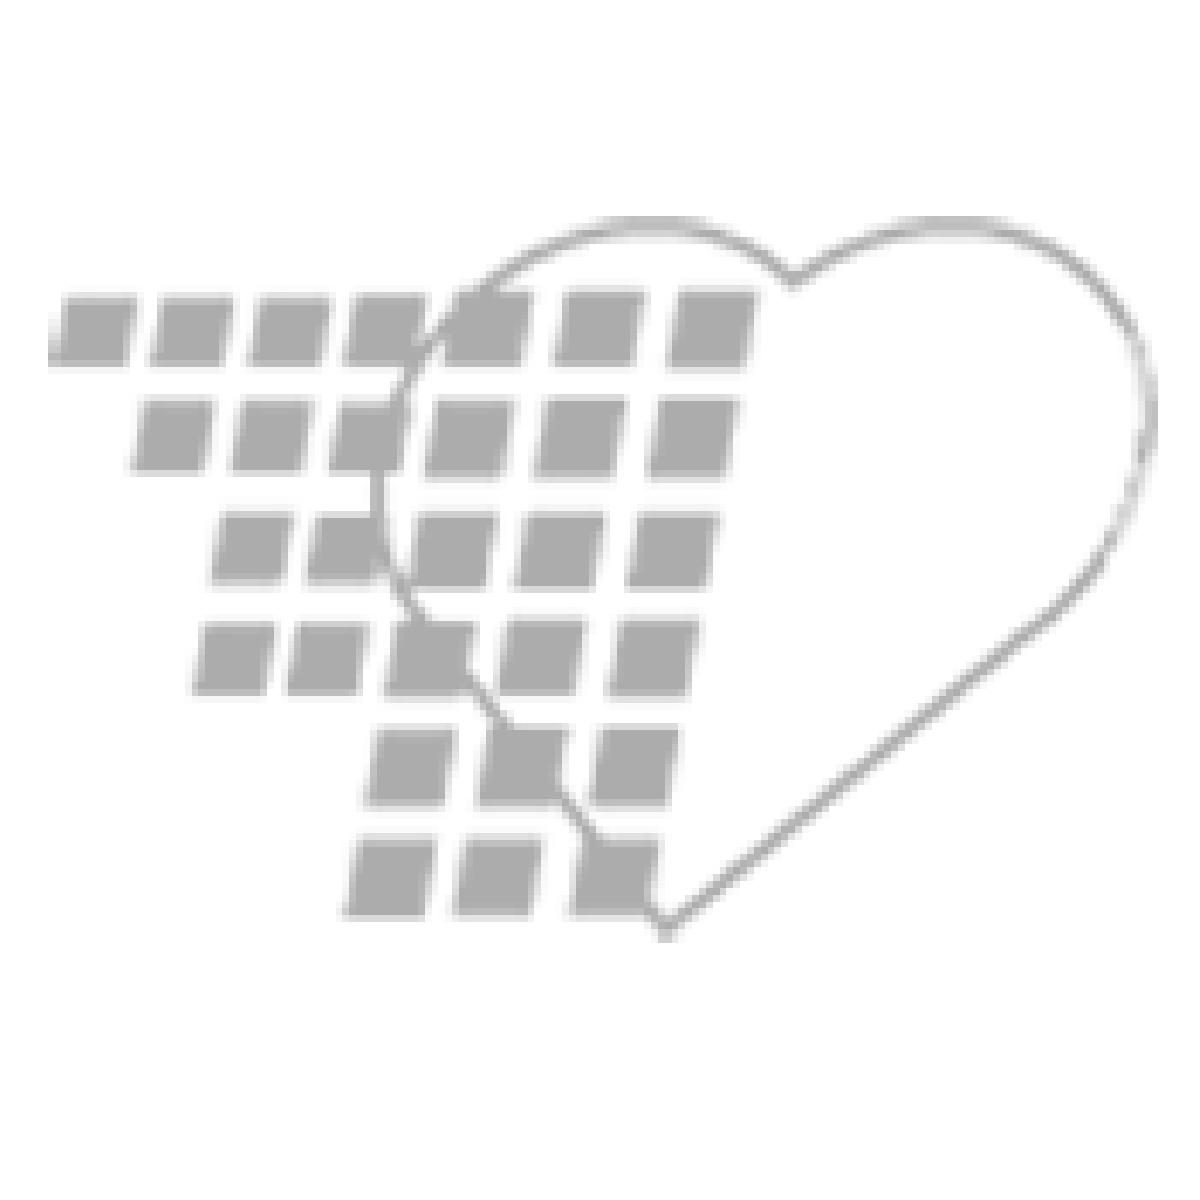 06-93-1040-1000ML - Demo Dose® Lactatd Ringr  's 5% Dextros IV Fluids 1000mL